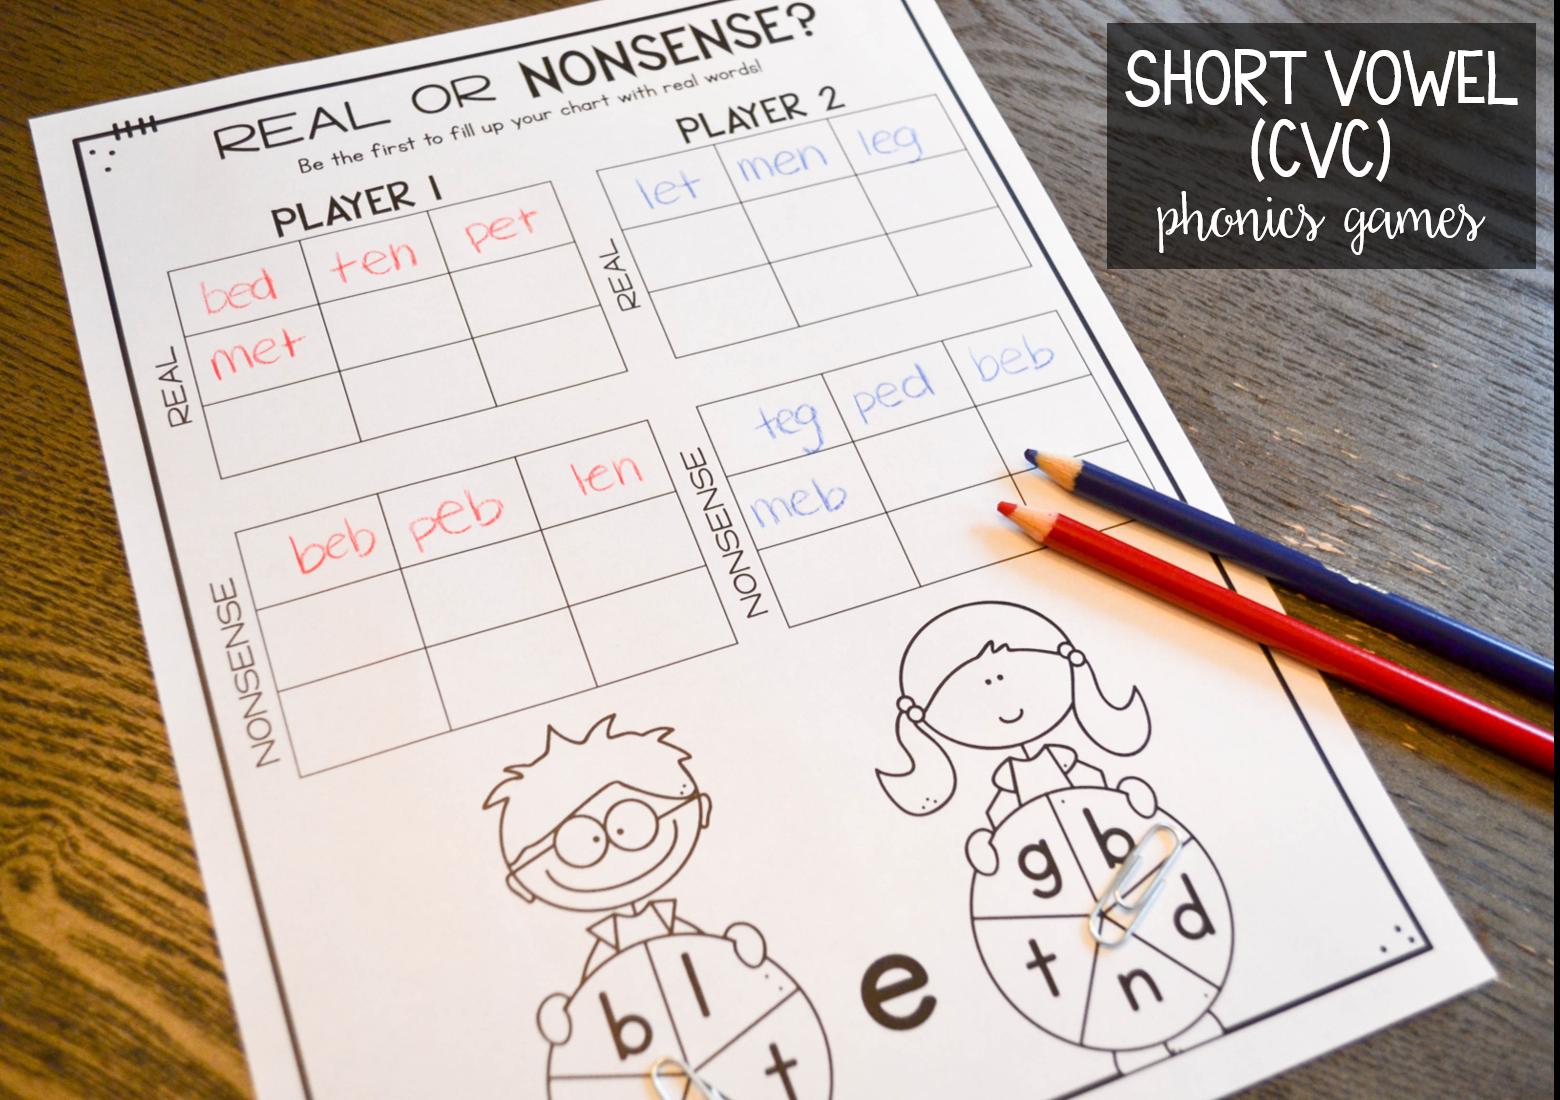 Short Vowel Cvc Phonics Games